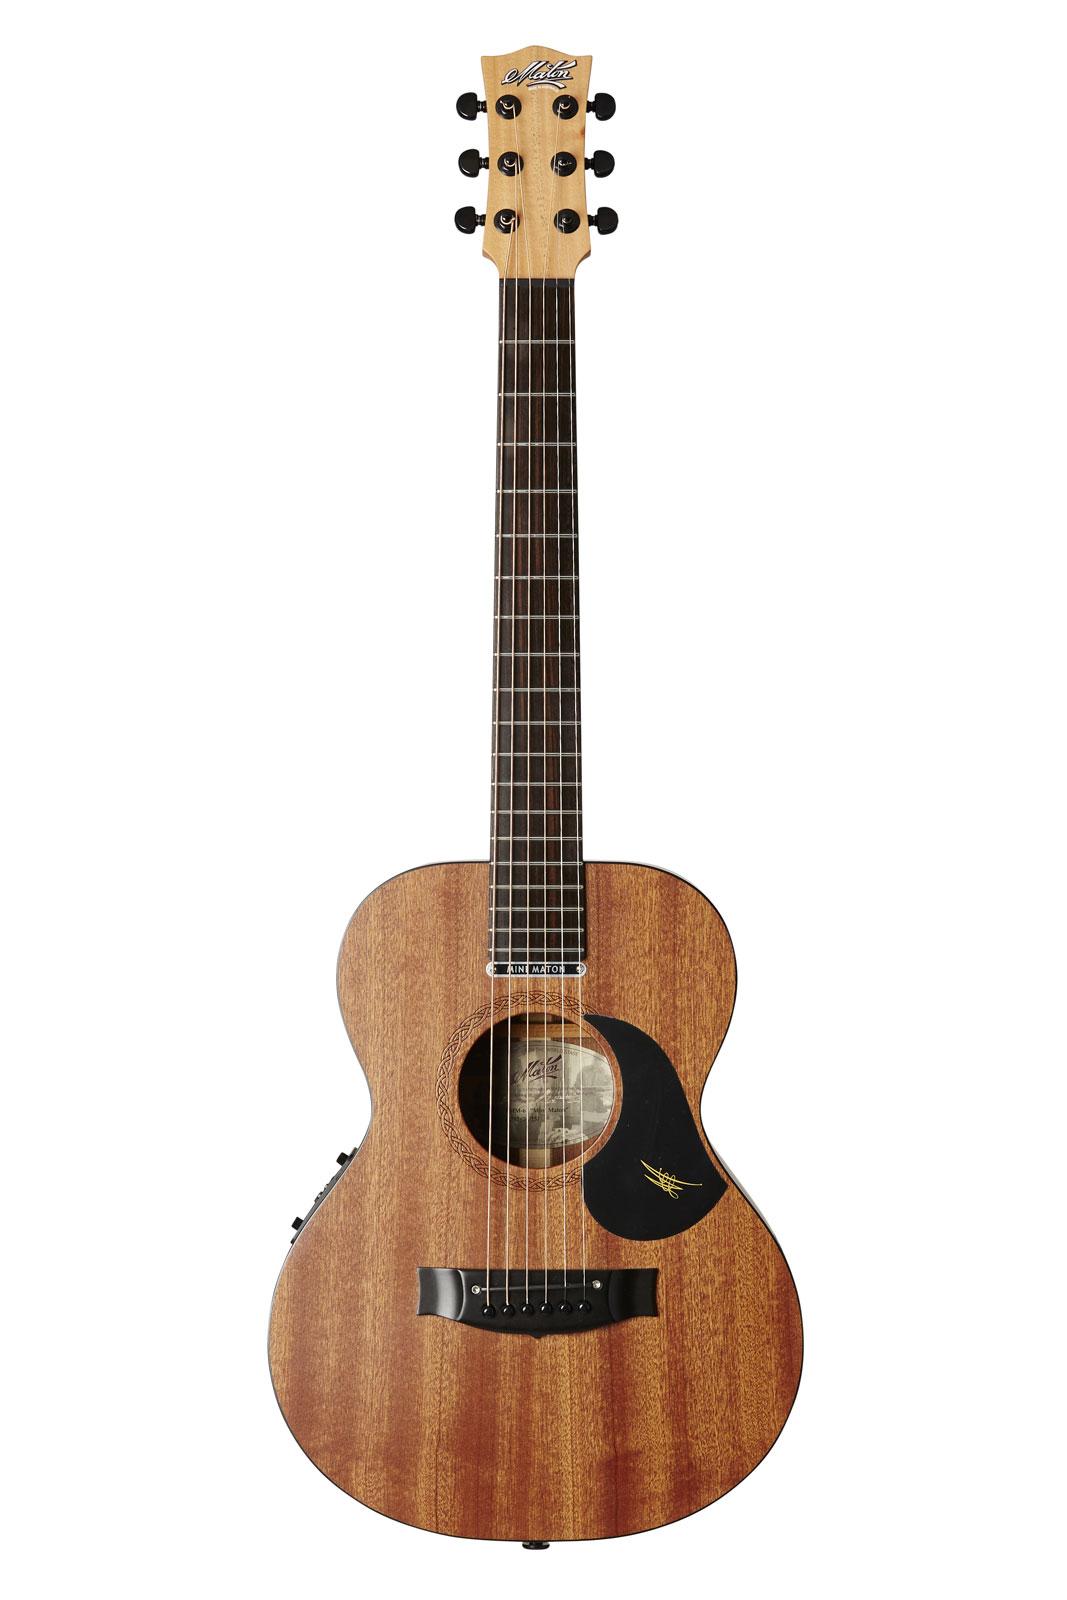 Maton Emm Mini Mahogany 230935 together with 100415 Oscar Schmidt Oe30 Es 335 Style Semi Hollow Electric Guitar Cherry further Washburn Ea9b Festival Acoustic Electric Guitar 30002513 as well Bass Guitars as well Fender One Precision Bass Guitars. on oscar schmidt jazz guitars